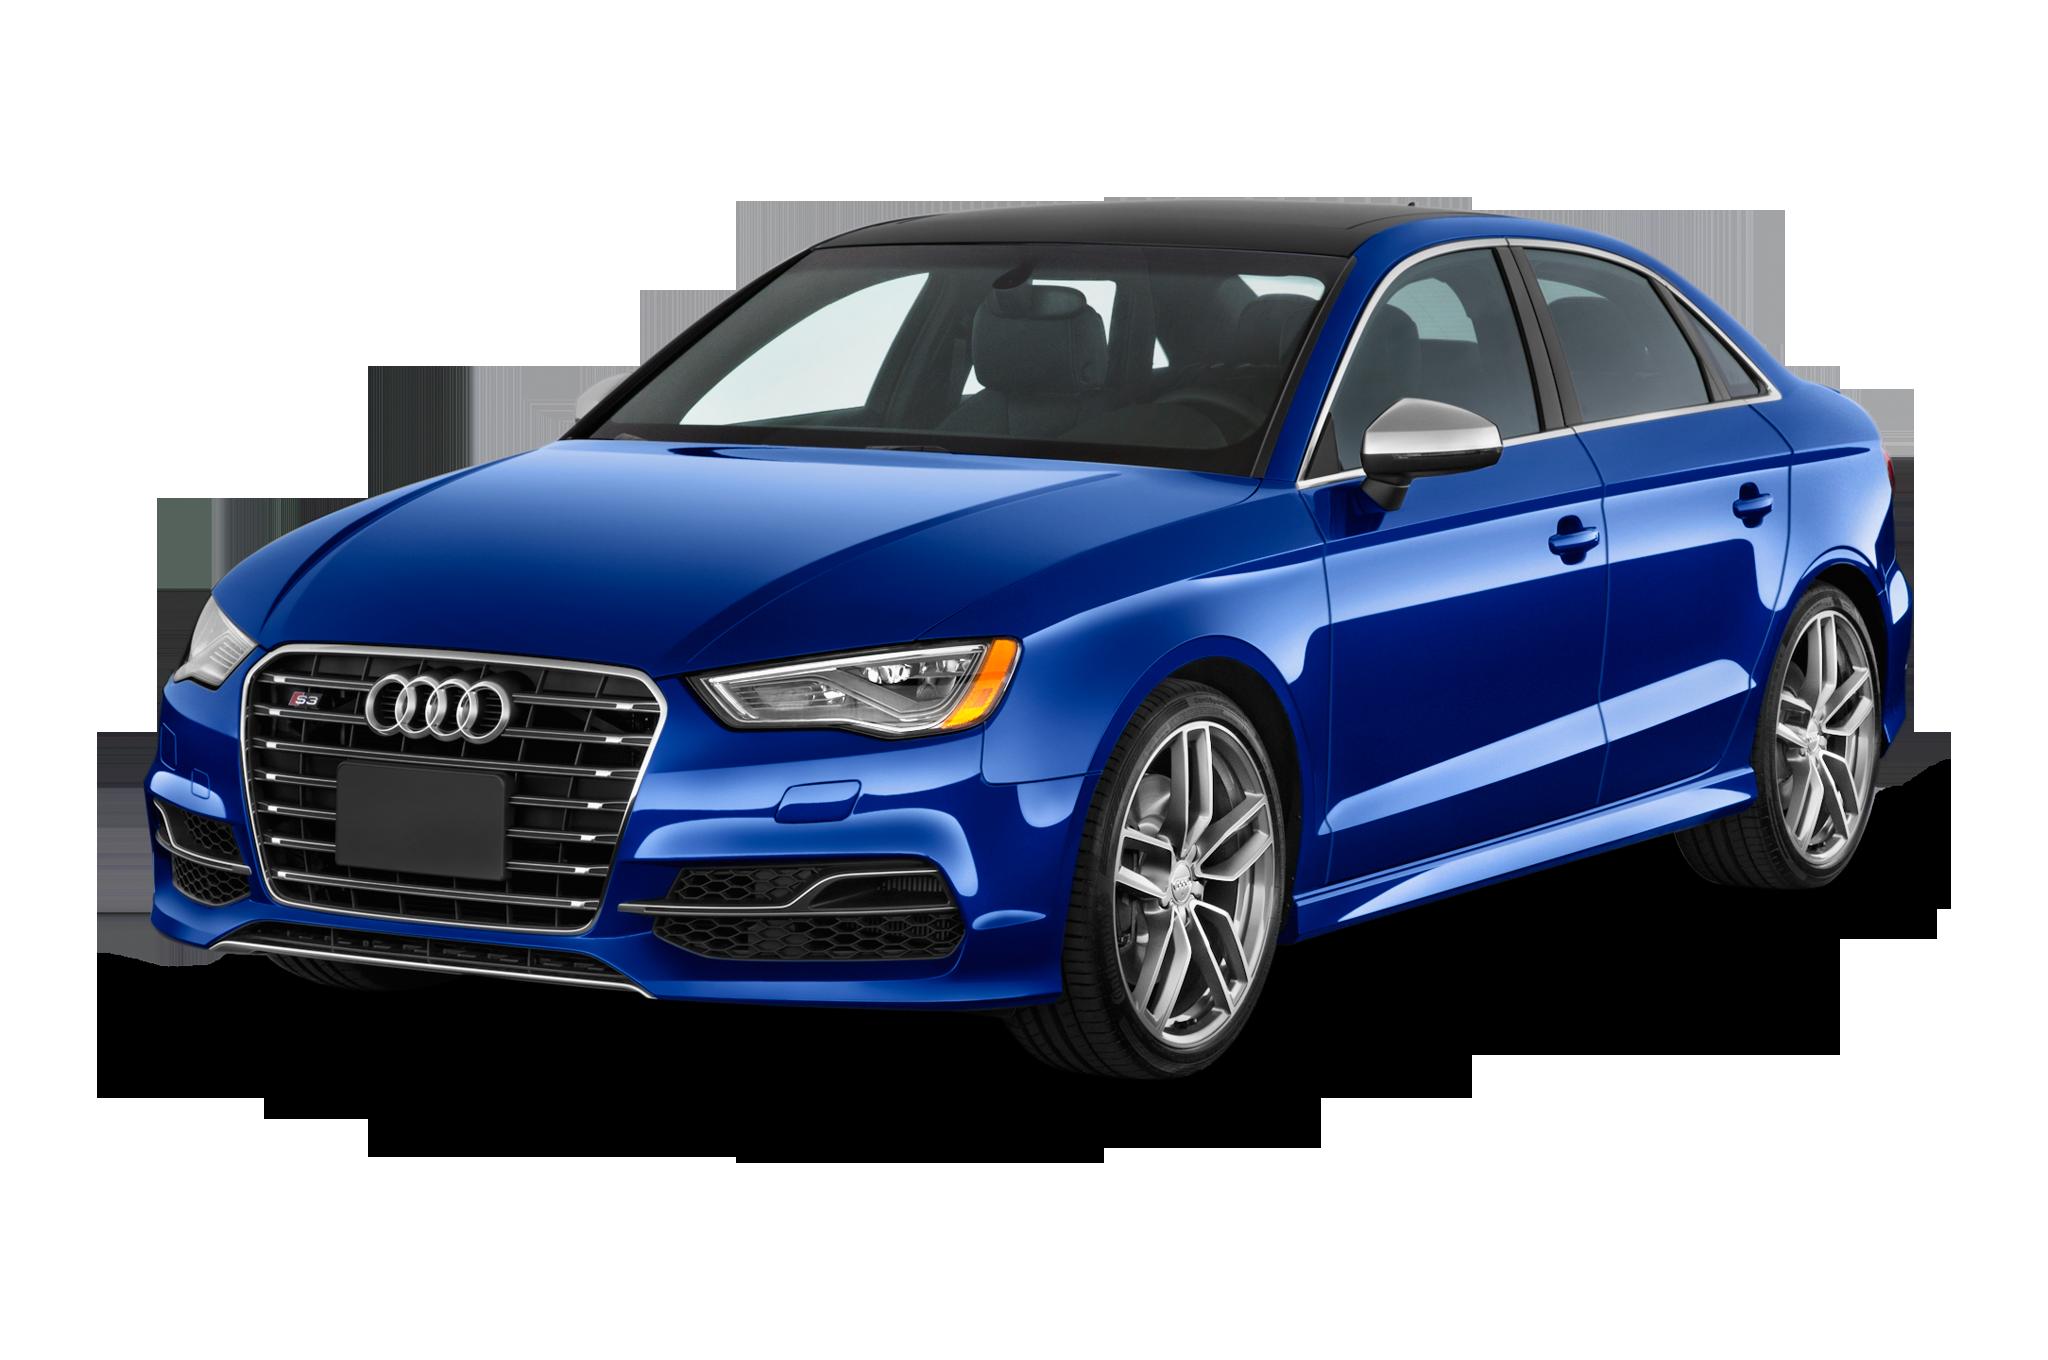 Blue Audi PNG Image Background.